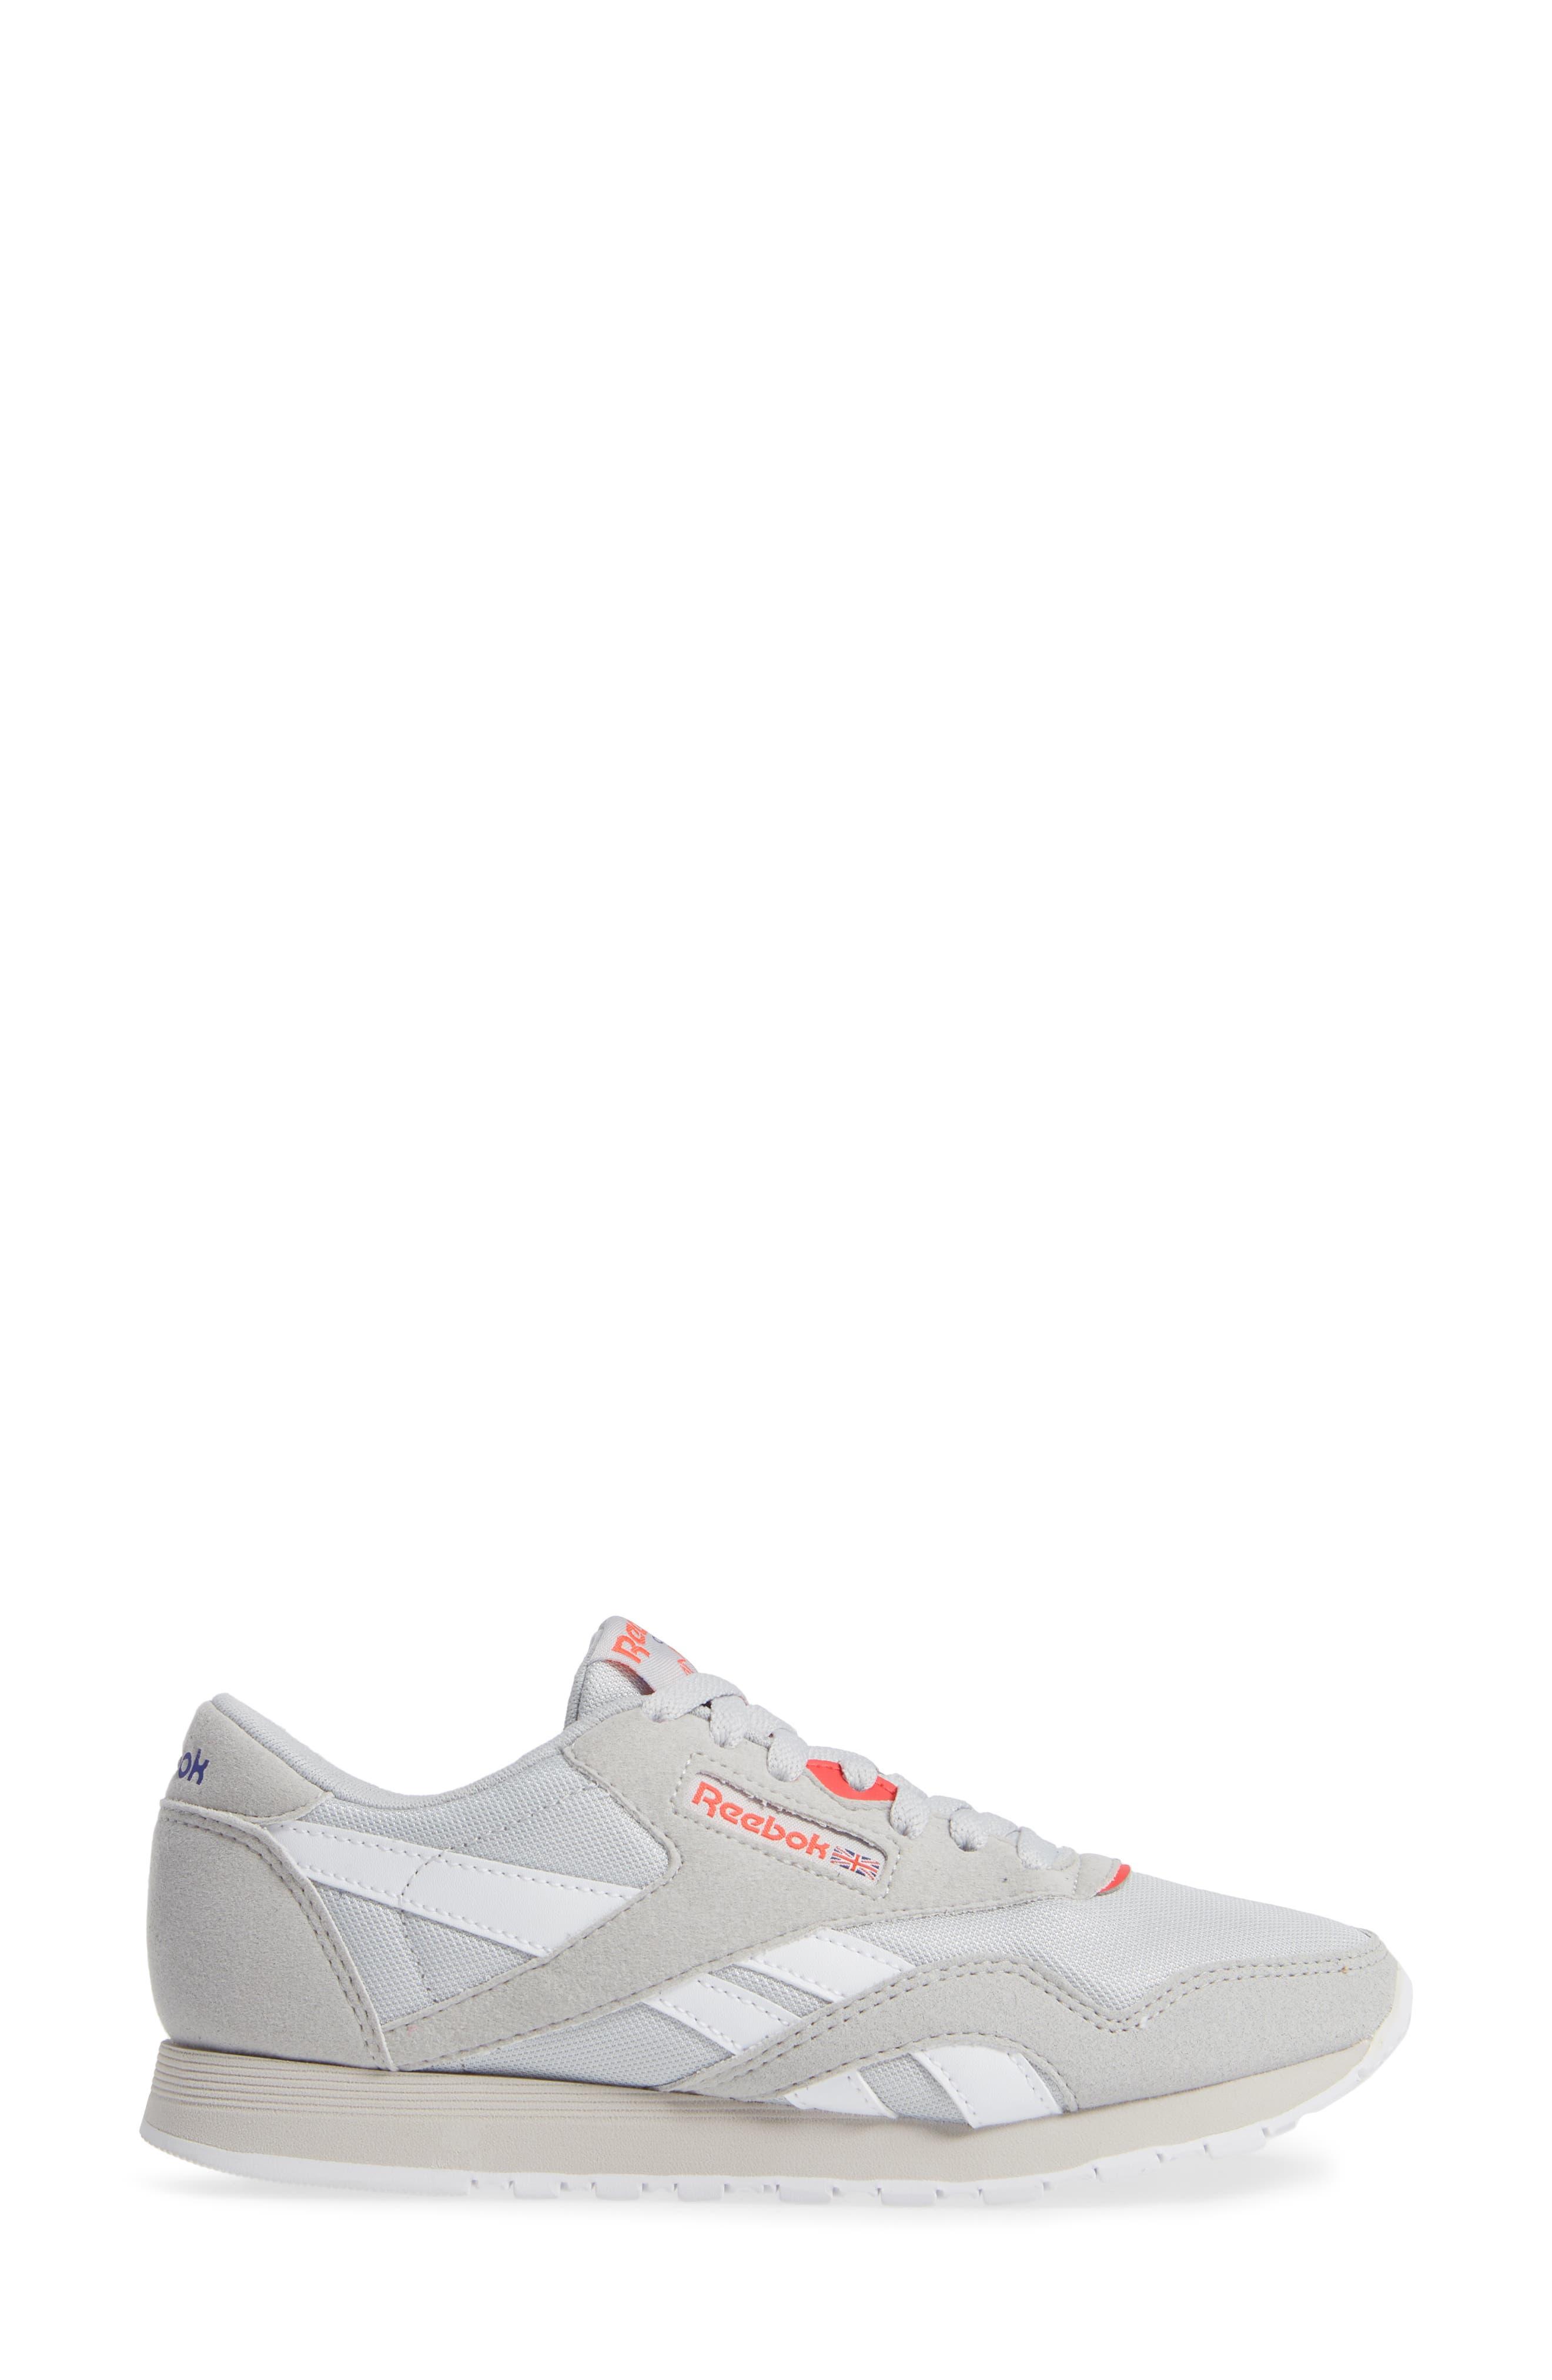 Classic Nylon TXT Sneaker,                             Alternate thumbnail 3, color,                             GREY/ NEON CHERRY/ PURPLE